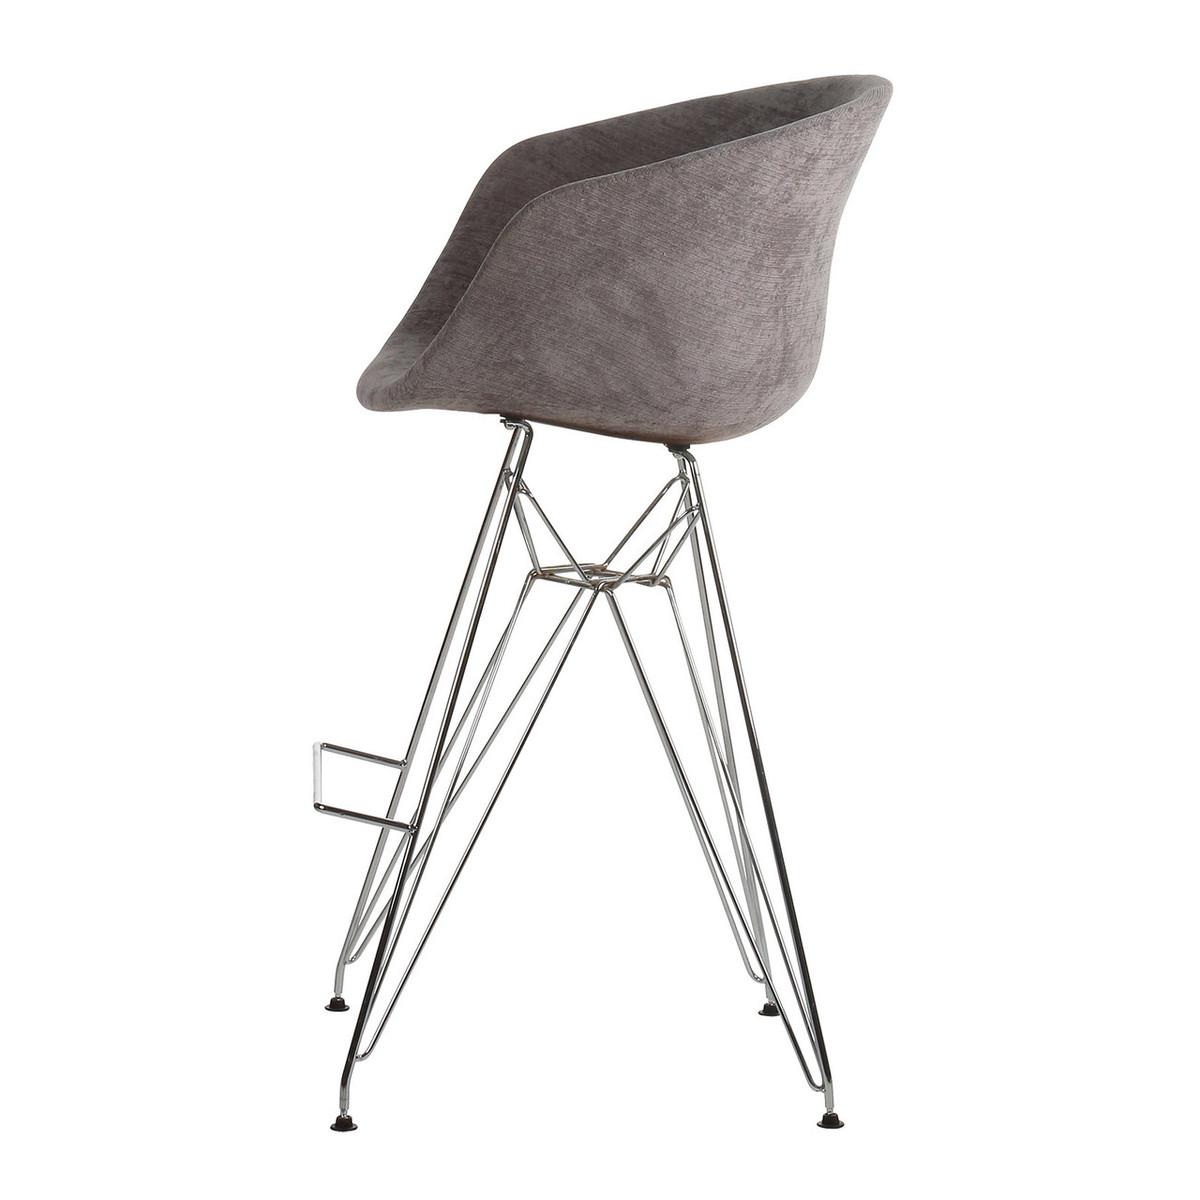 Fabulous Danish Modern Dark Grey Counter Stool With Metal Eiffel Legs Lamtechconsult Wood Chair Design Ideas Lamtechconsultcom